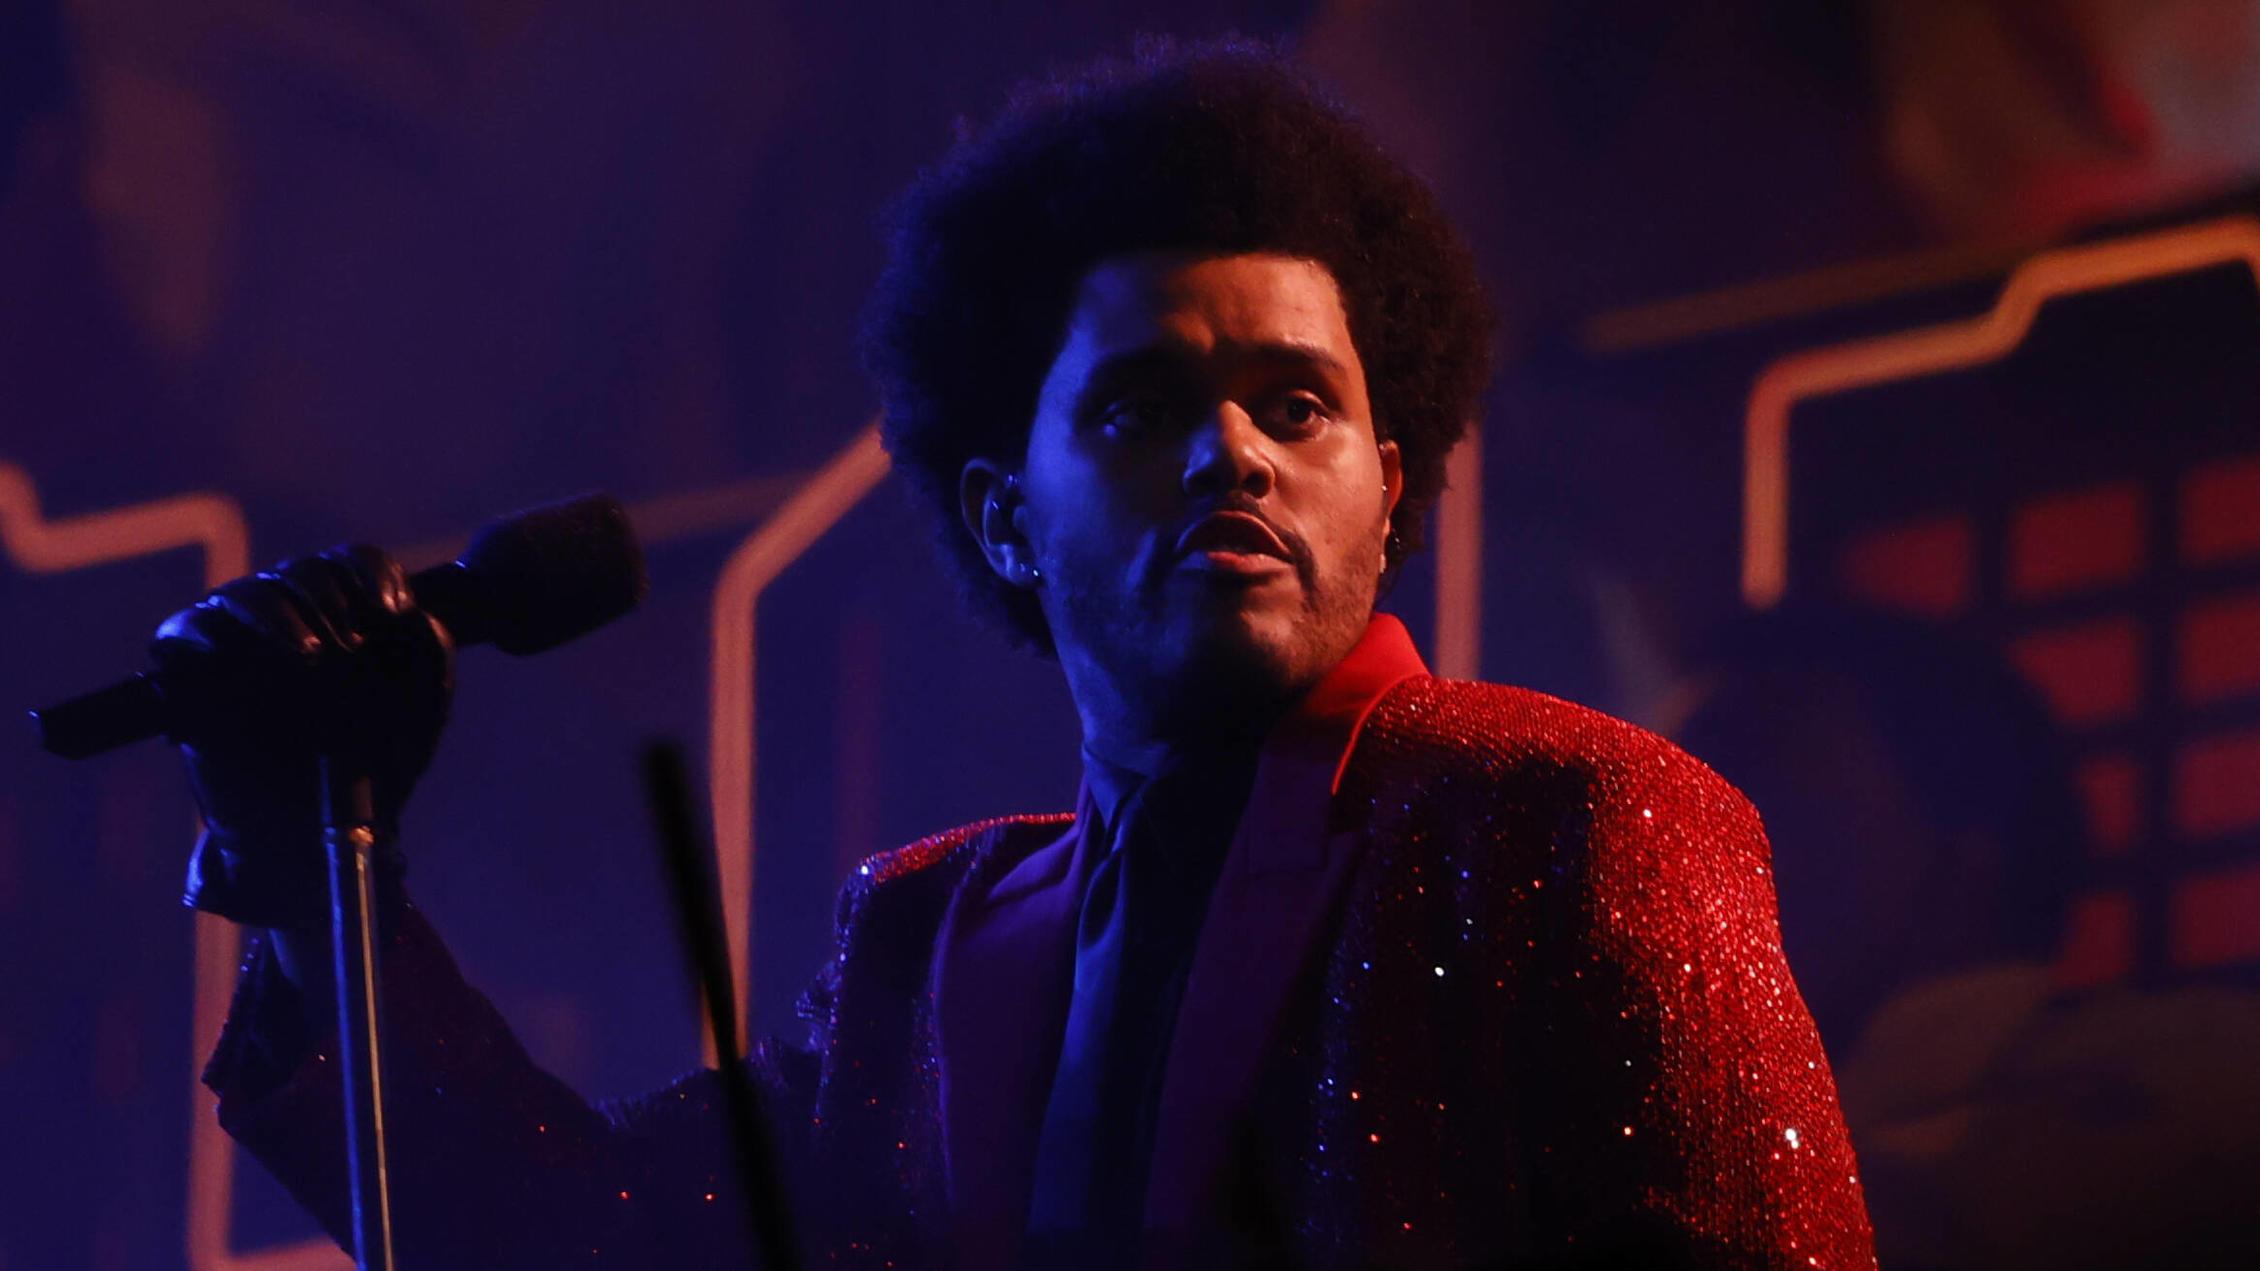 SuperBowl: Sogar Steven Gätjen zerreißt Halbzeit-Show von The Weeknd - VIP.de, Star News